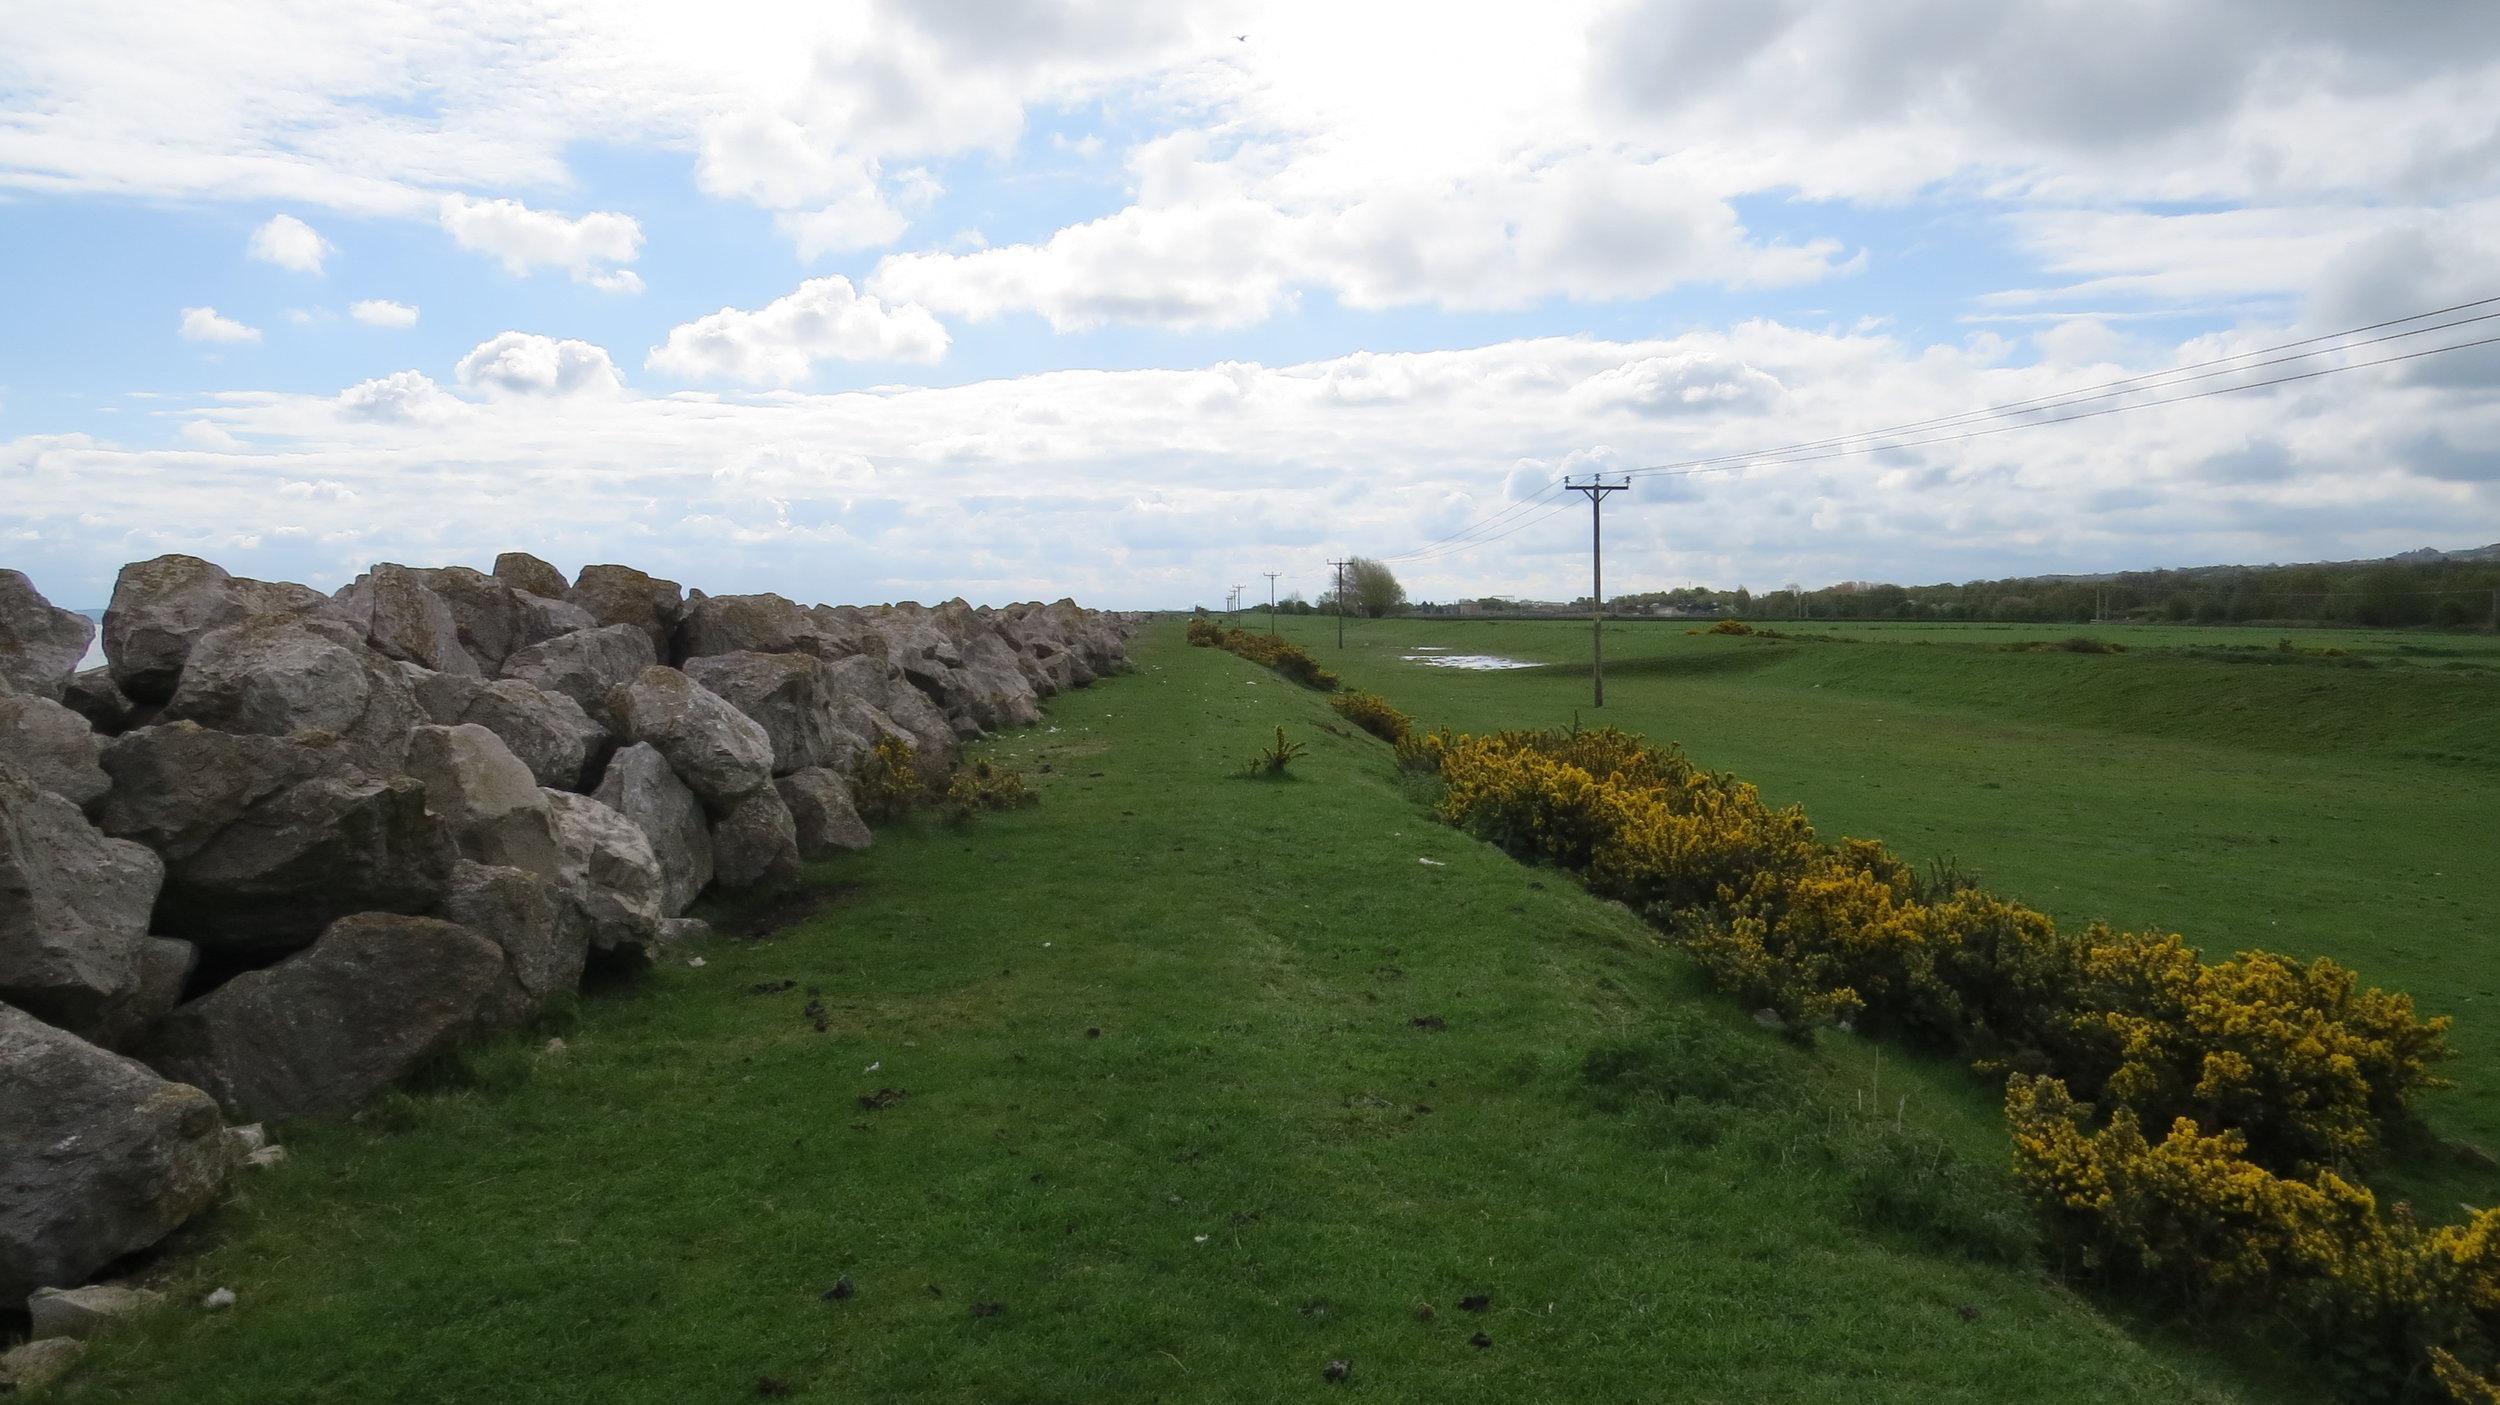 Embankment by 'The Marsh'